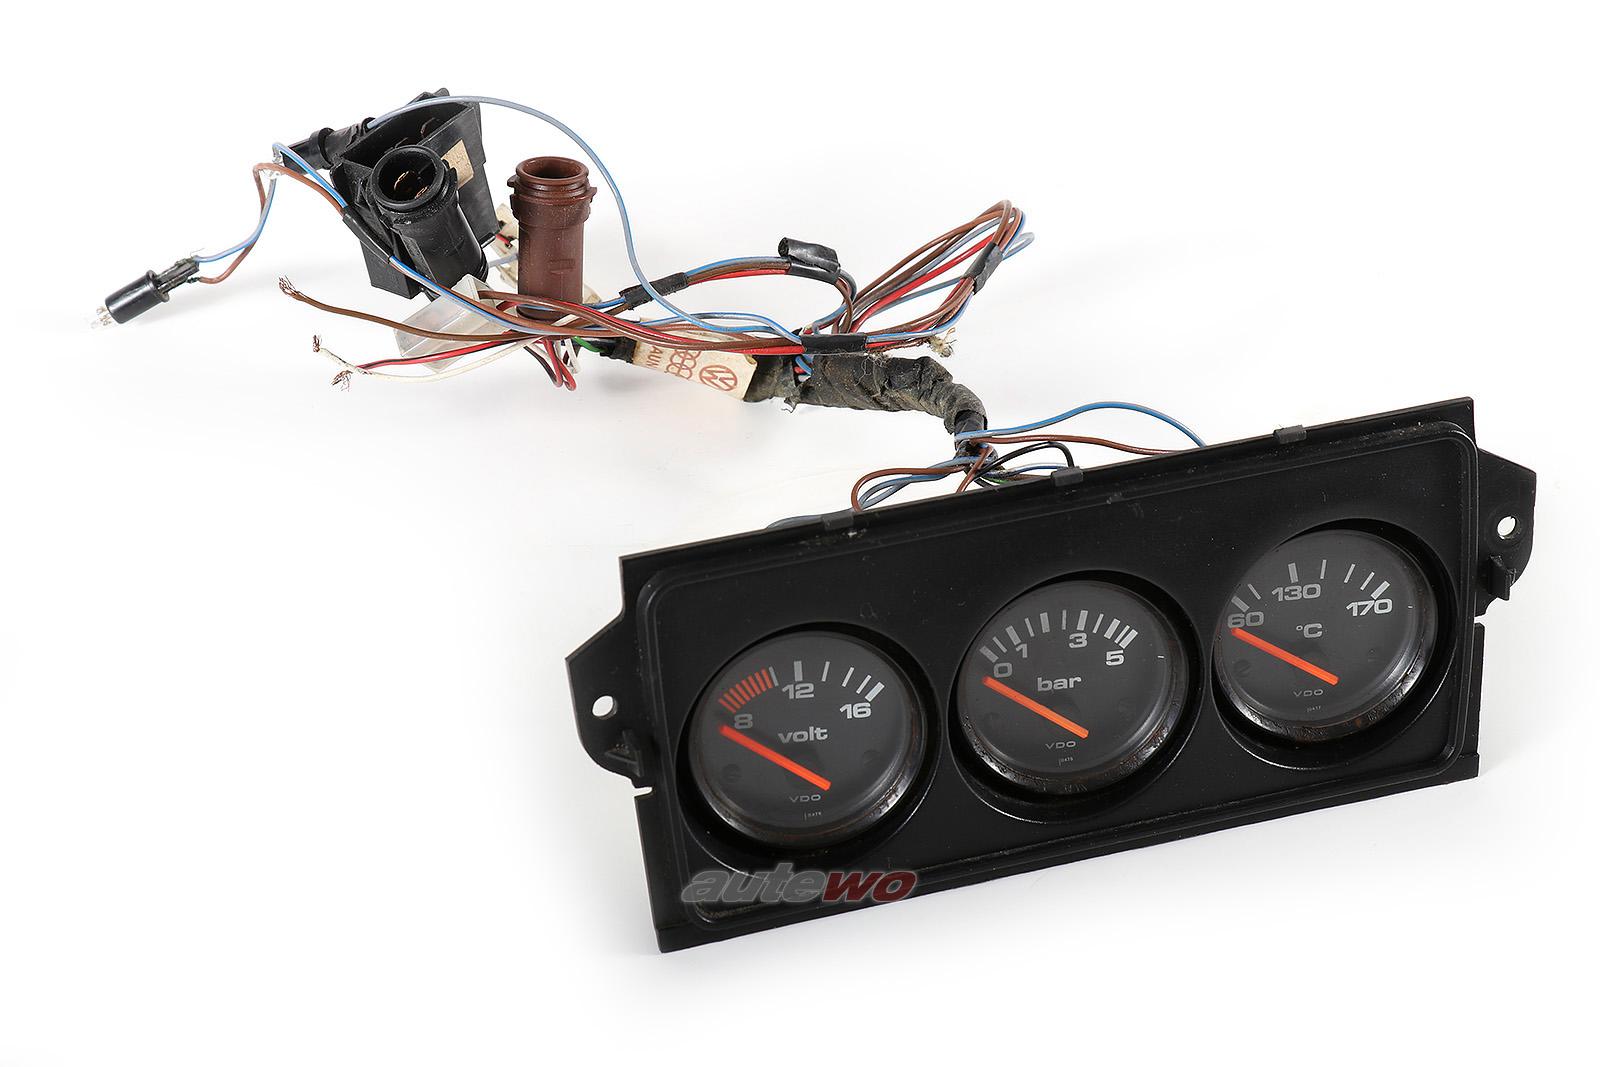 811919531C/811919551A/811919541C/811863321E Audi 80 GTE 81/85 Zusatzinstrumente